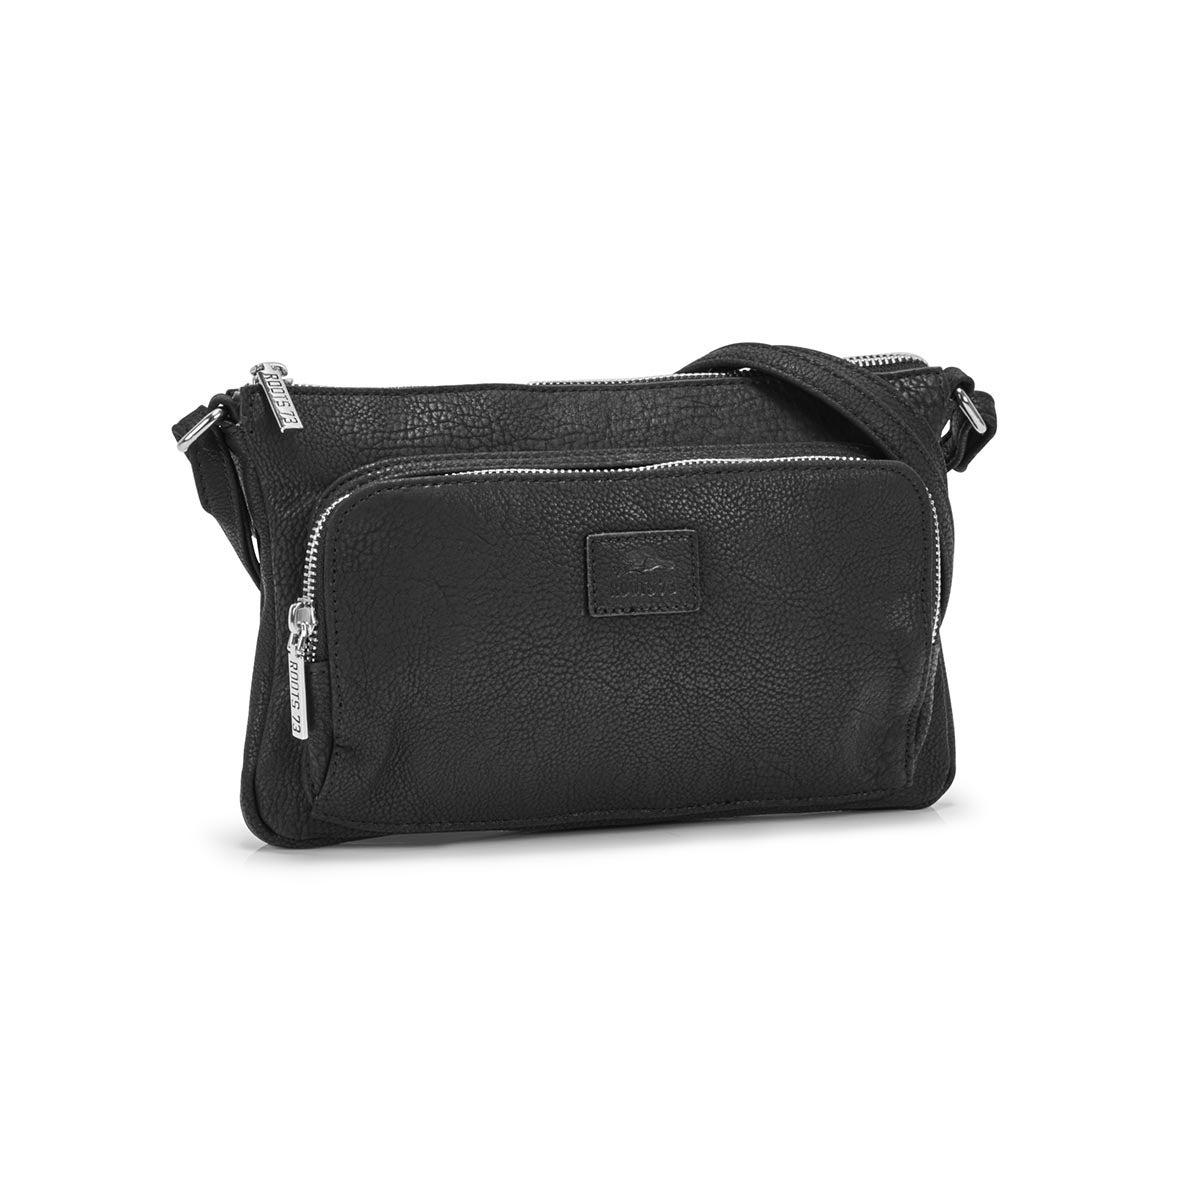 Women's  R4886 black cross body bag